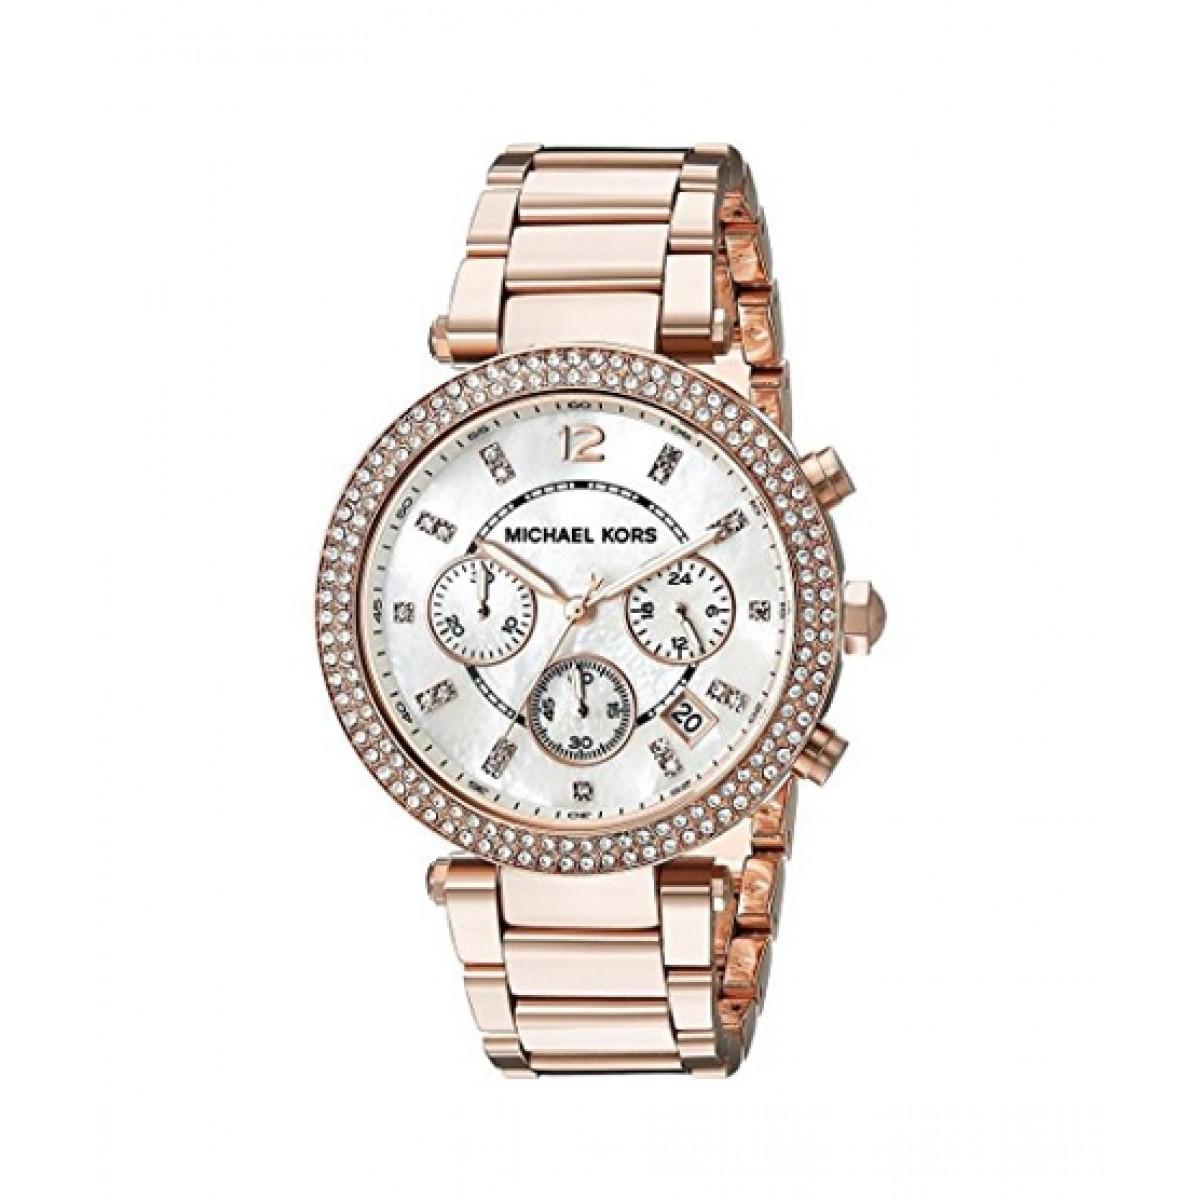 abb74ee1bf649 Michael Kors Parker Women s Watch Price in Pakistan